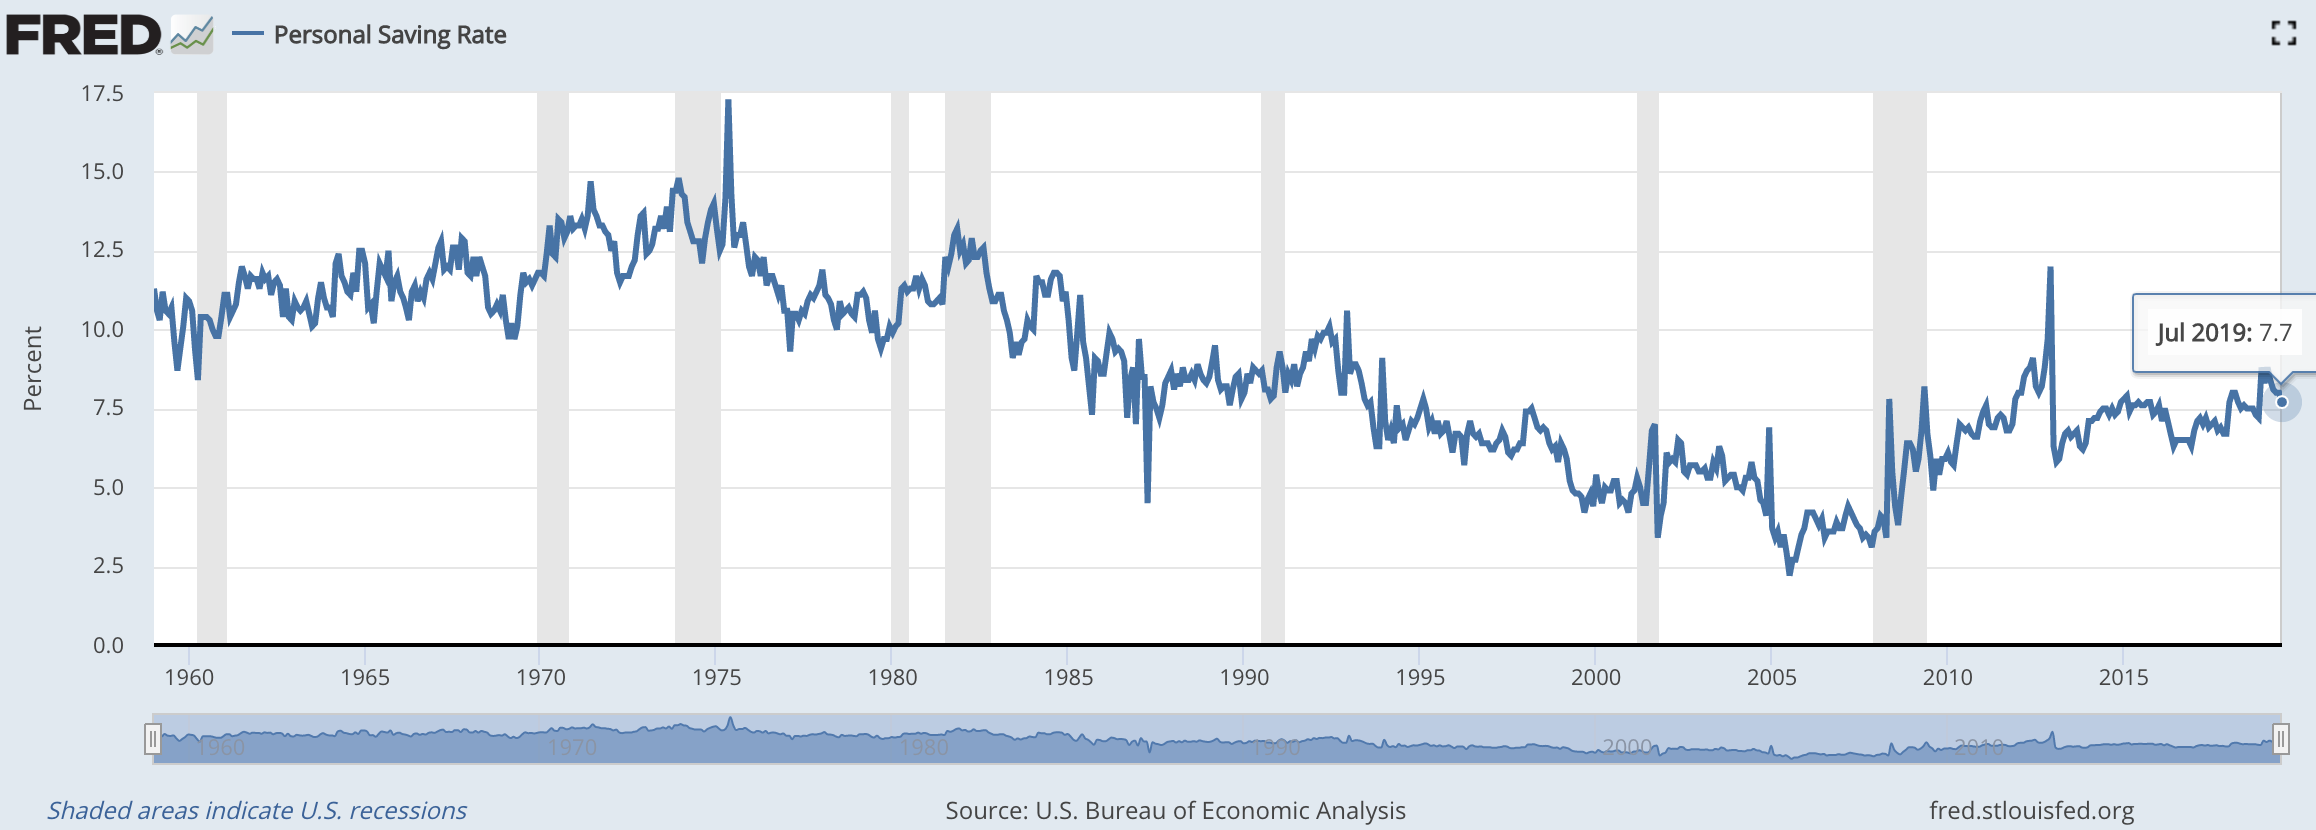 U.S. Personal Savings Rate